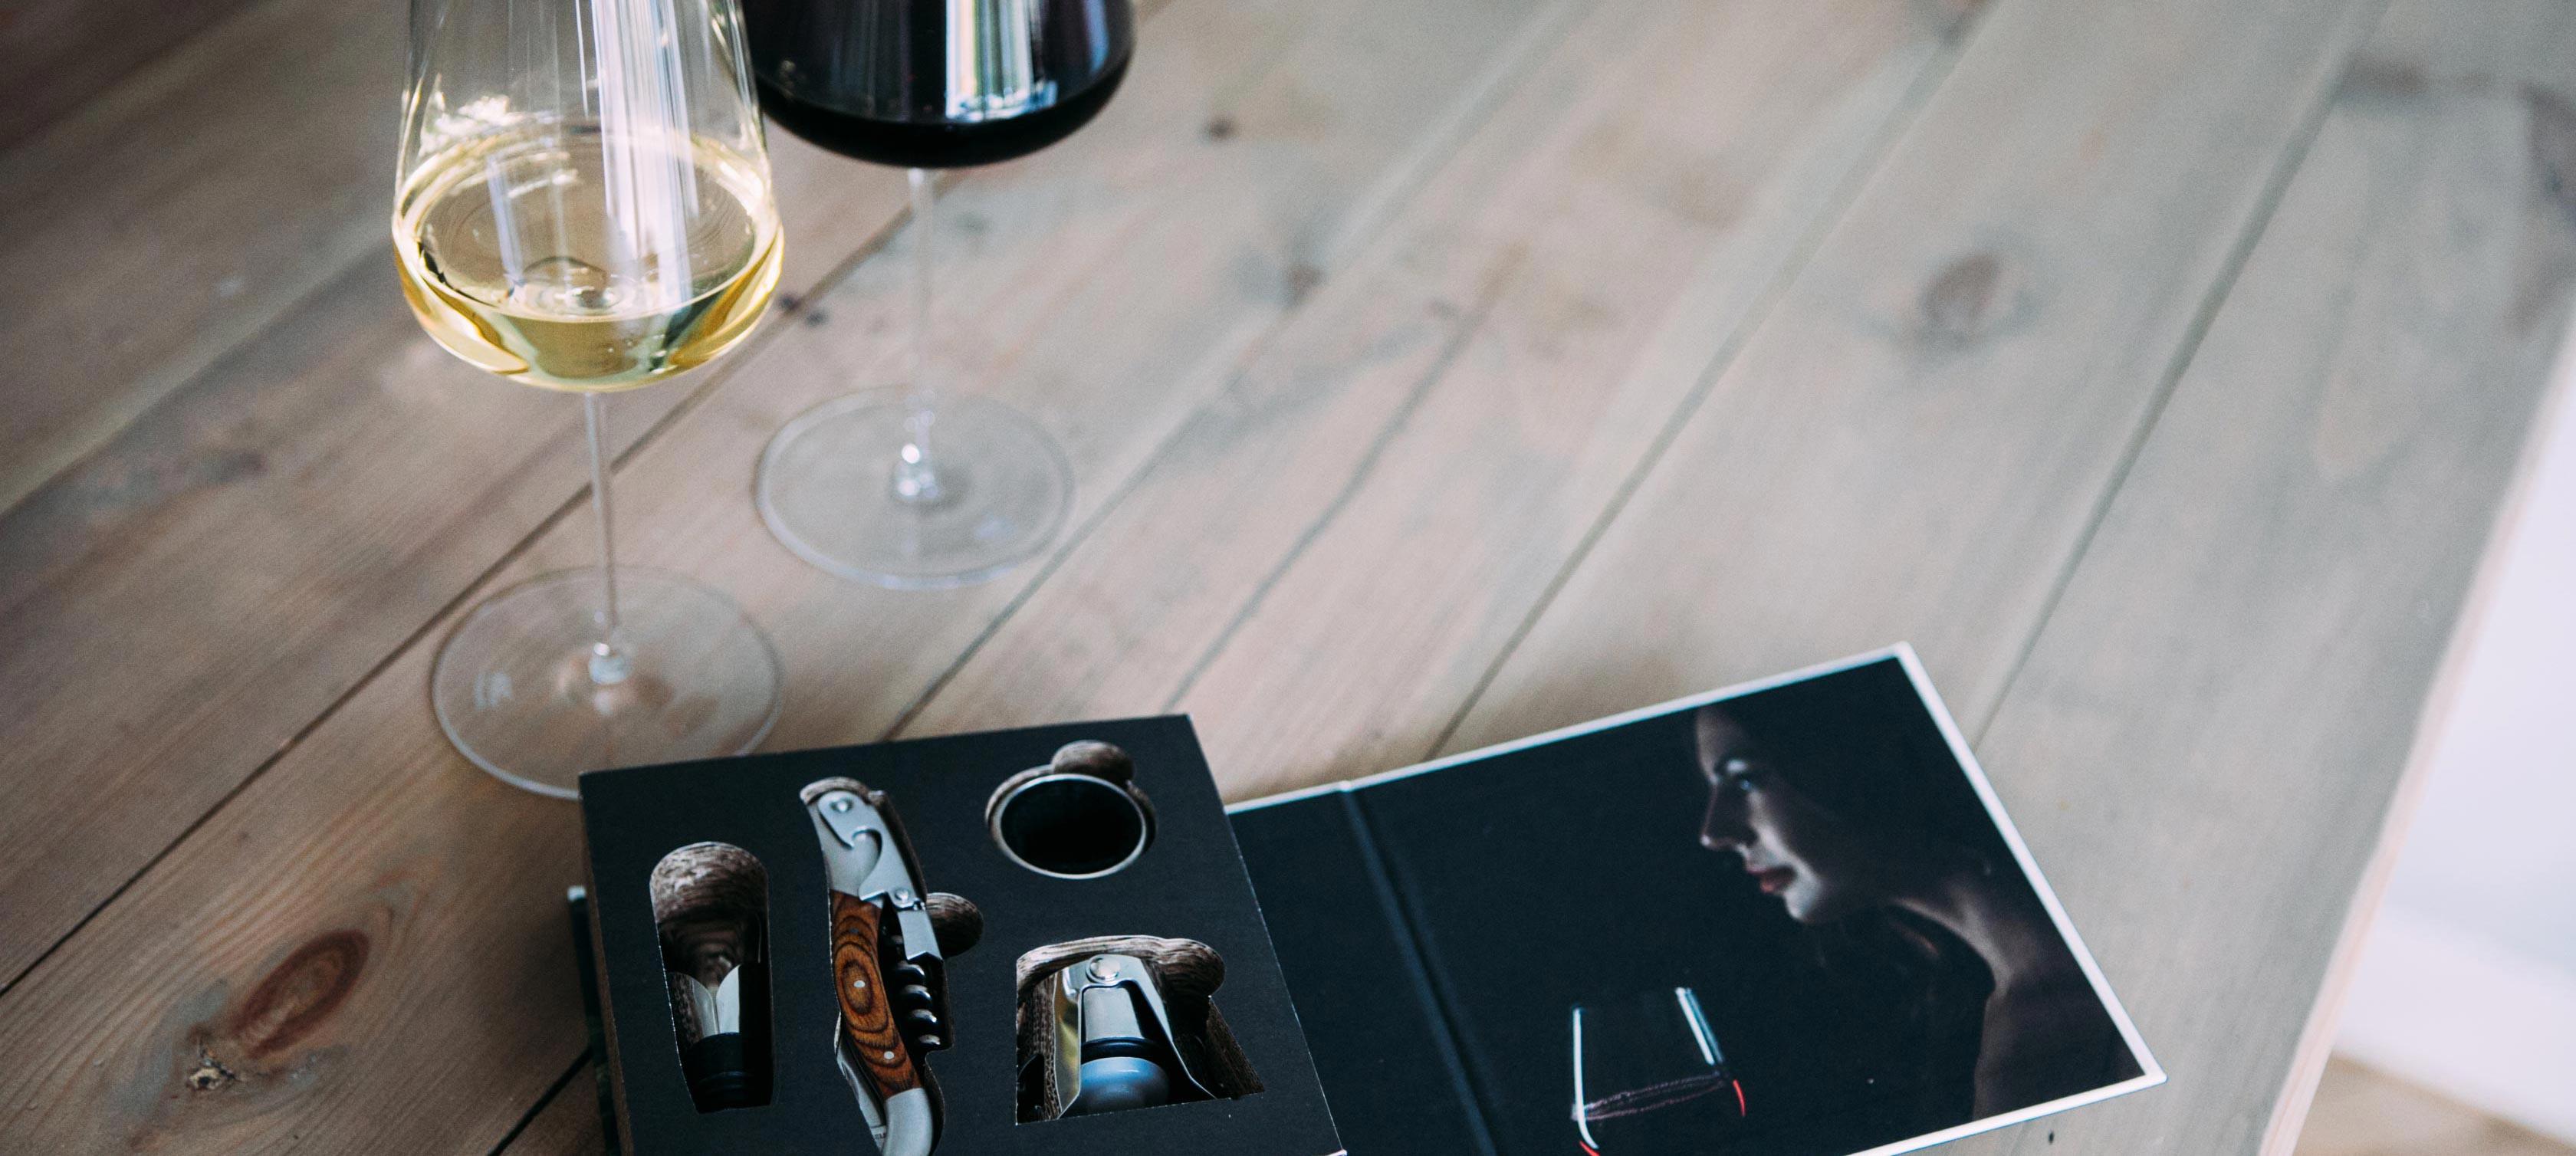 Категория – Вино